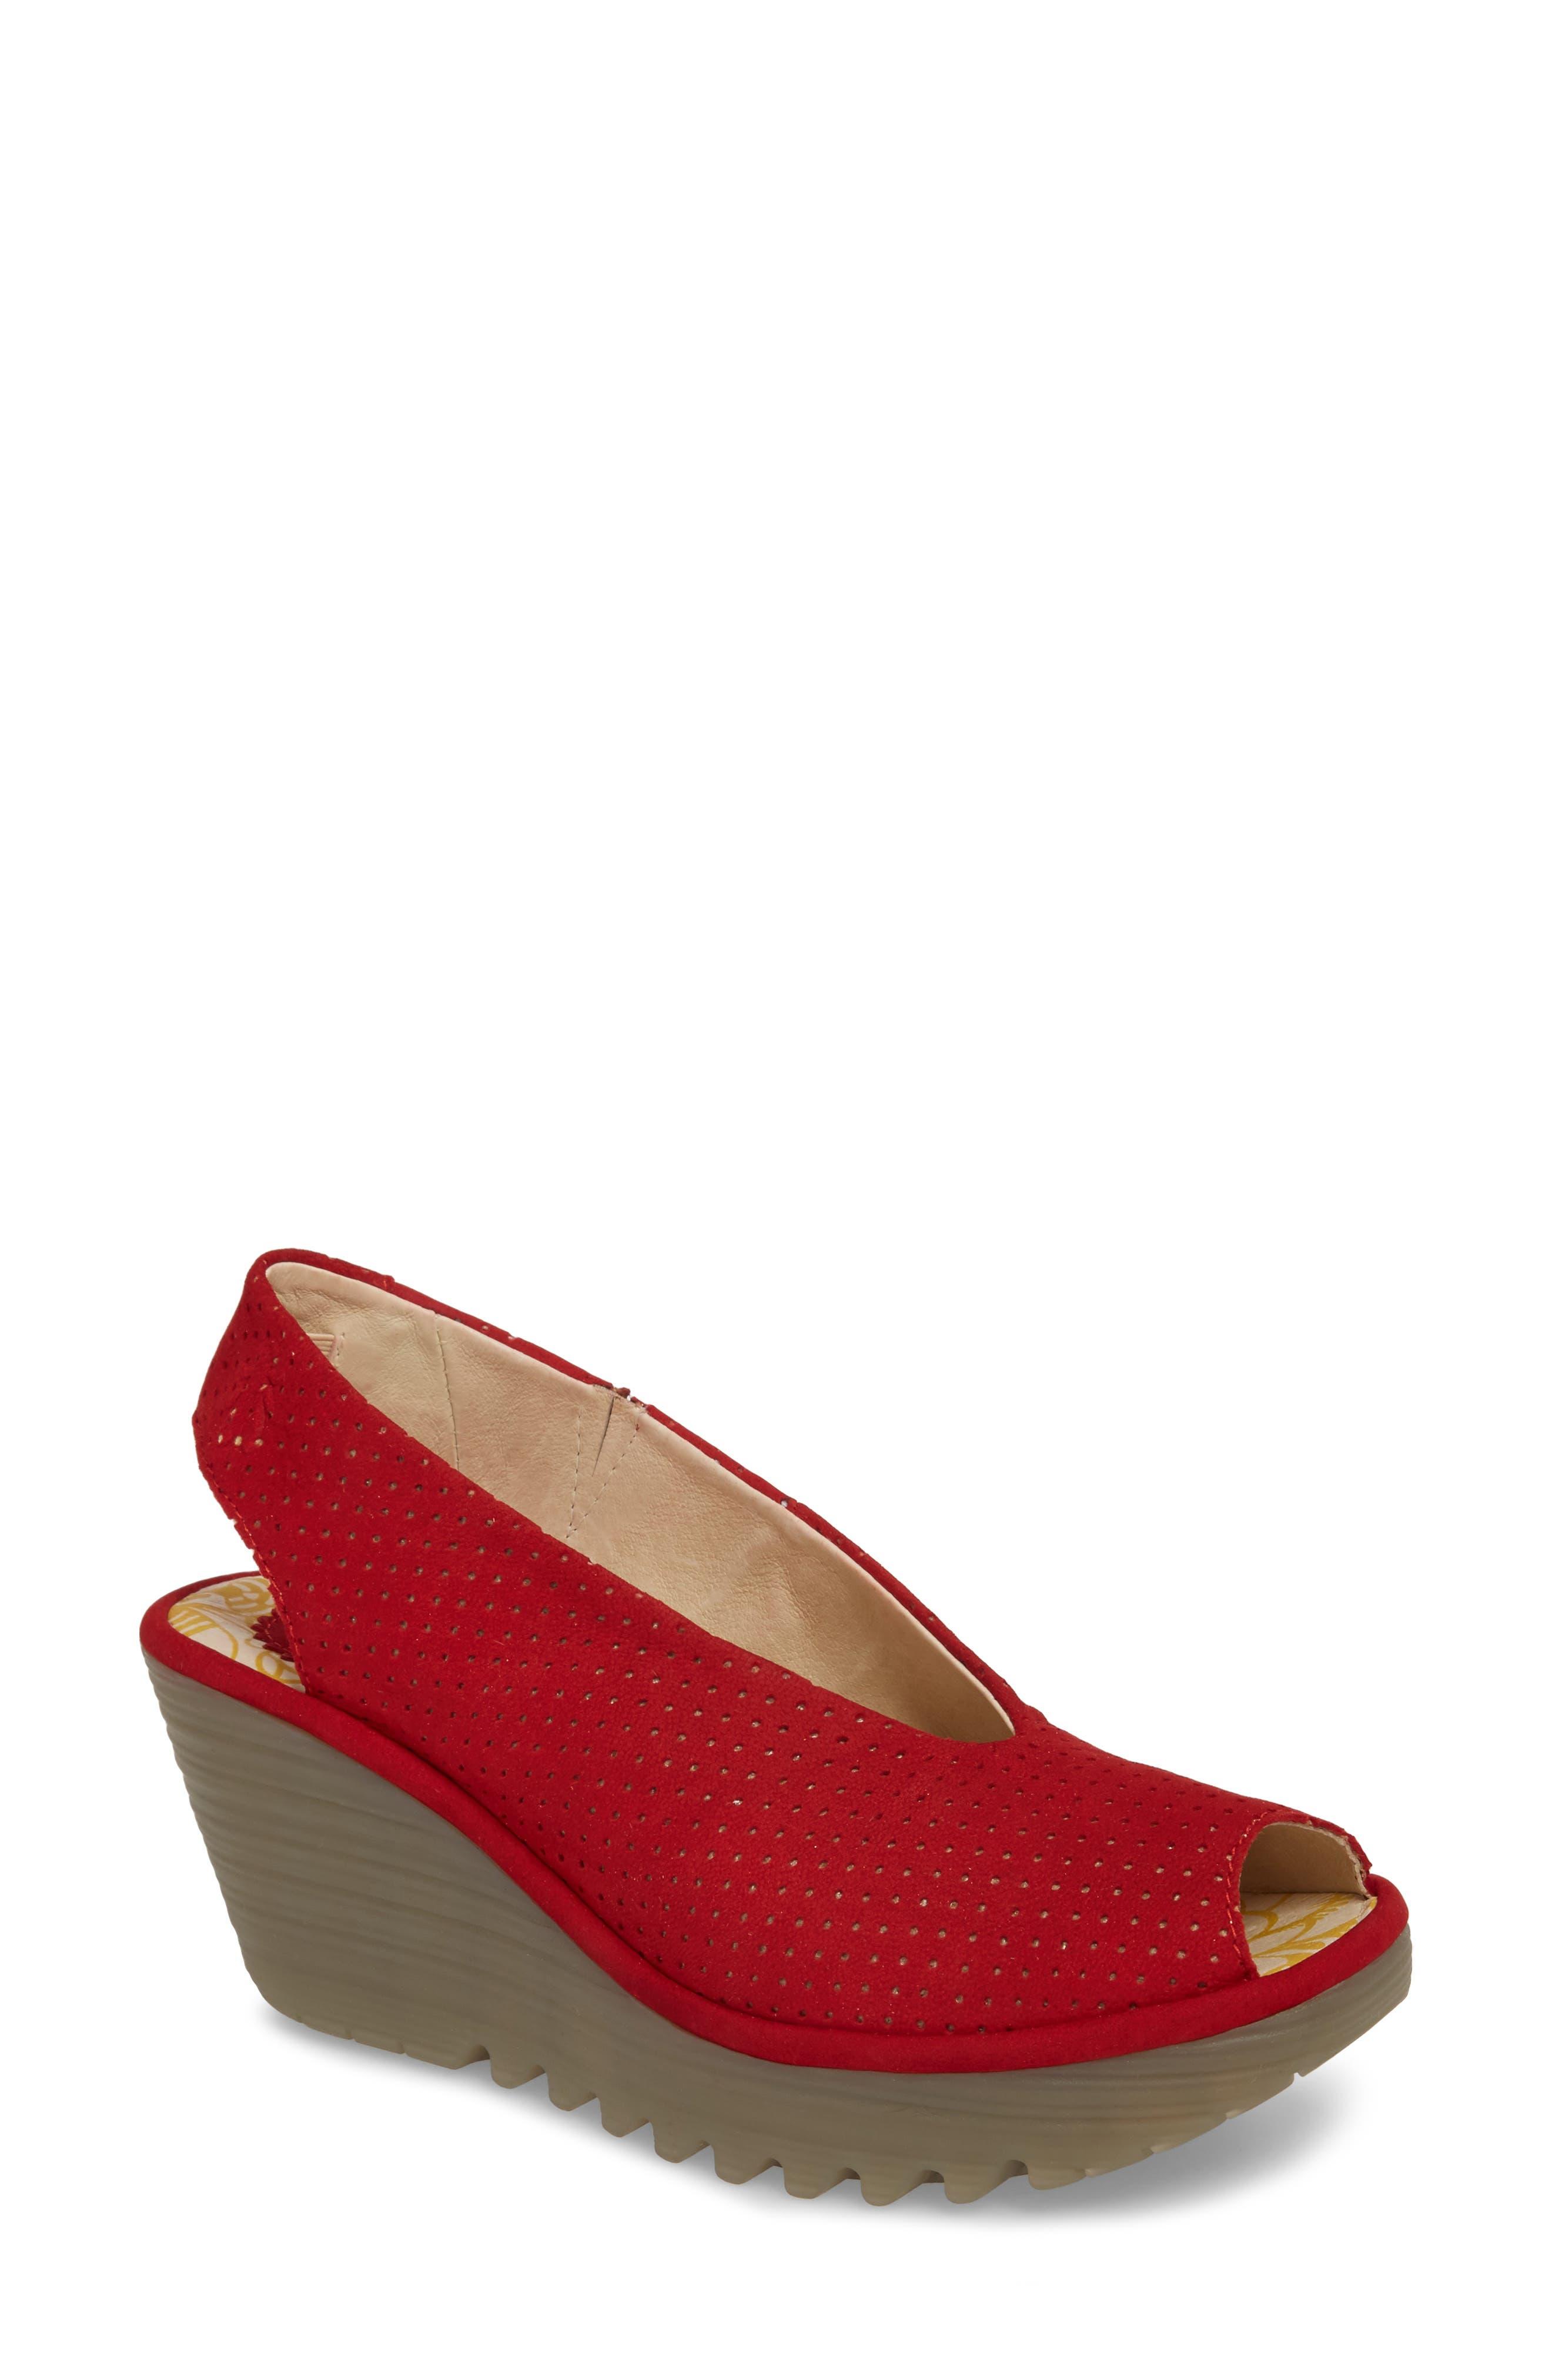 Fly London Yazu Wedge Sandal, Red